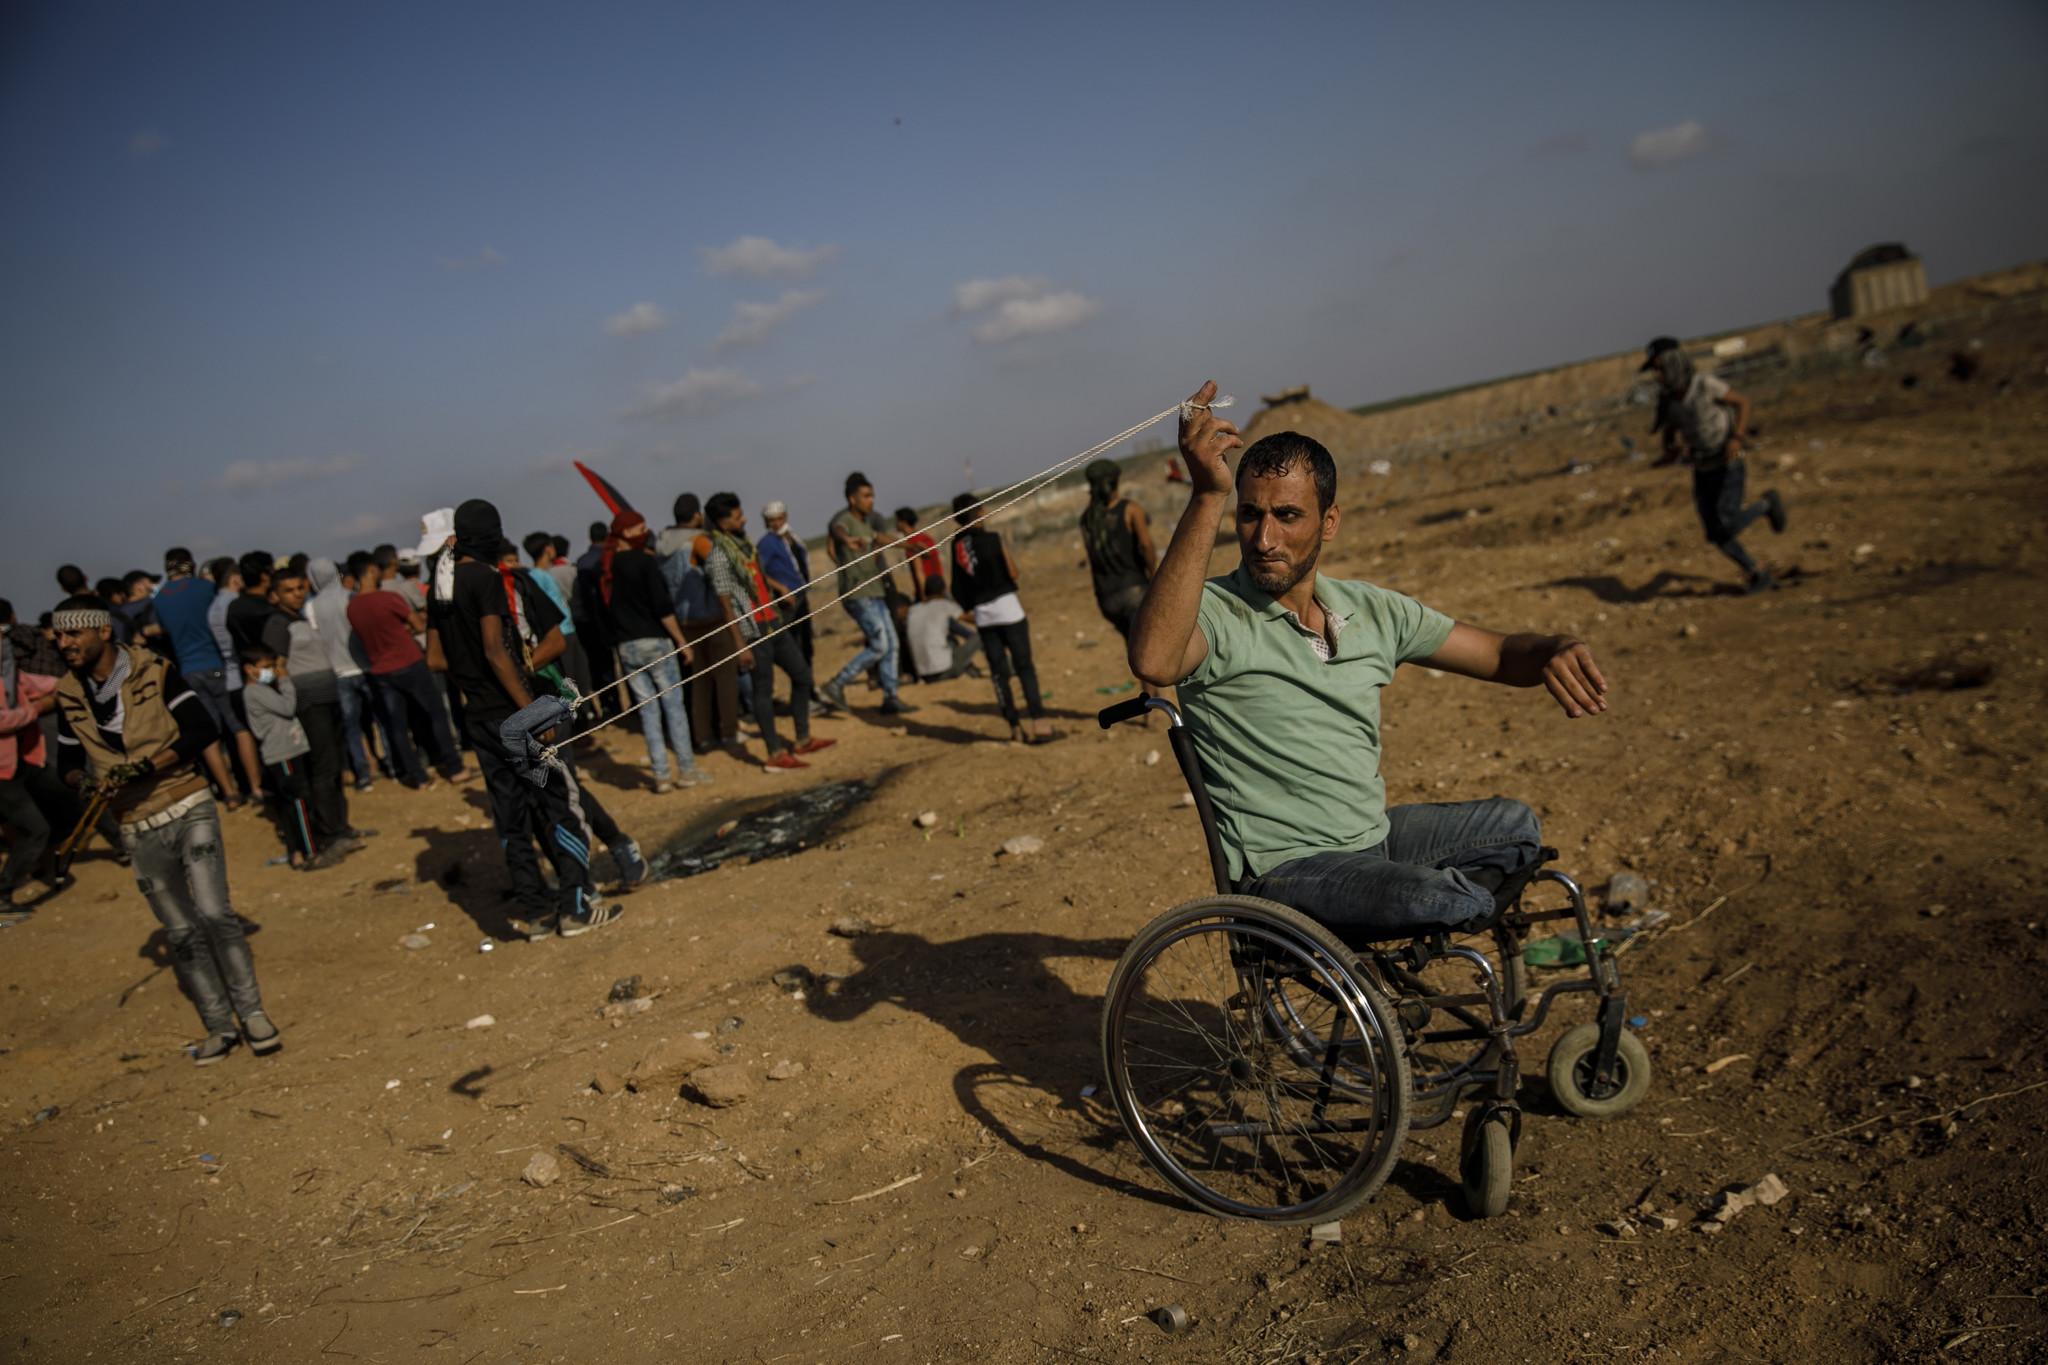 GAZA CITY, GAZA STRIP — FRIDAY, MAY 11, 2018: Sabir Al-Ashqar, who lost his legs in the 2008-2009 G